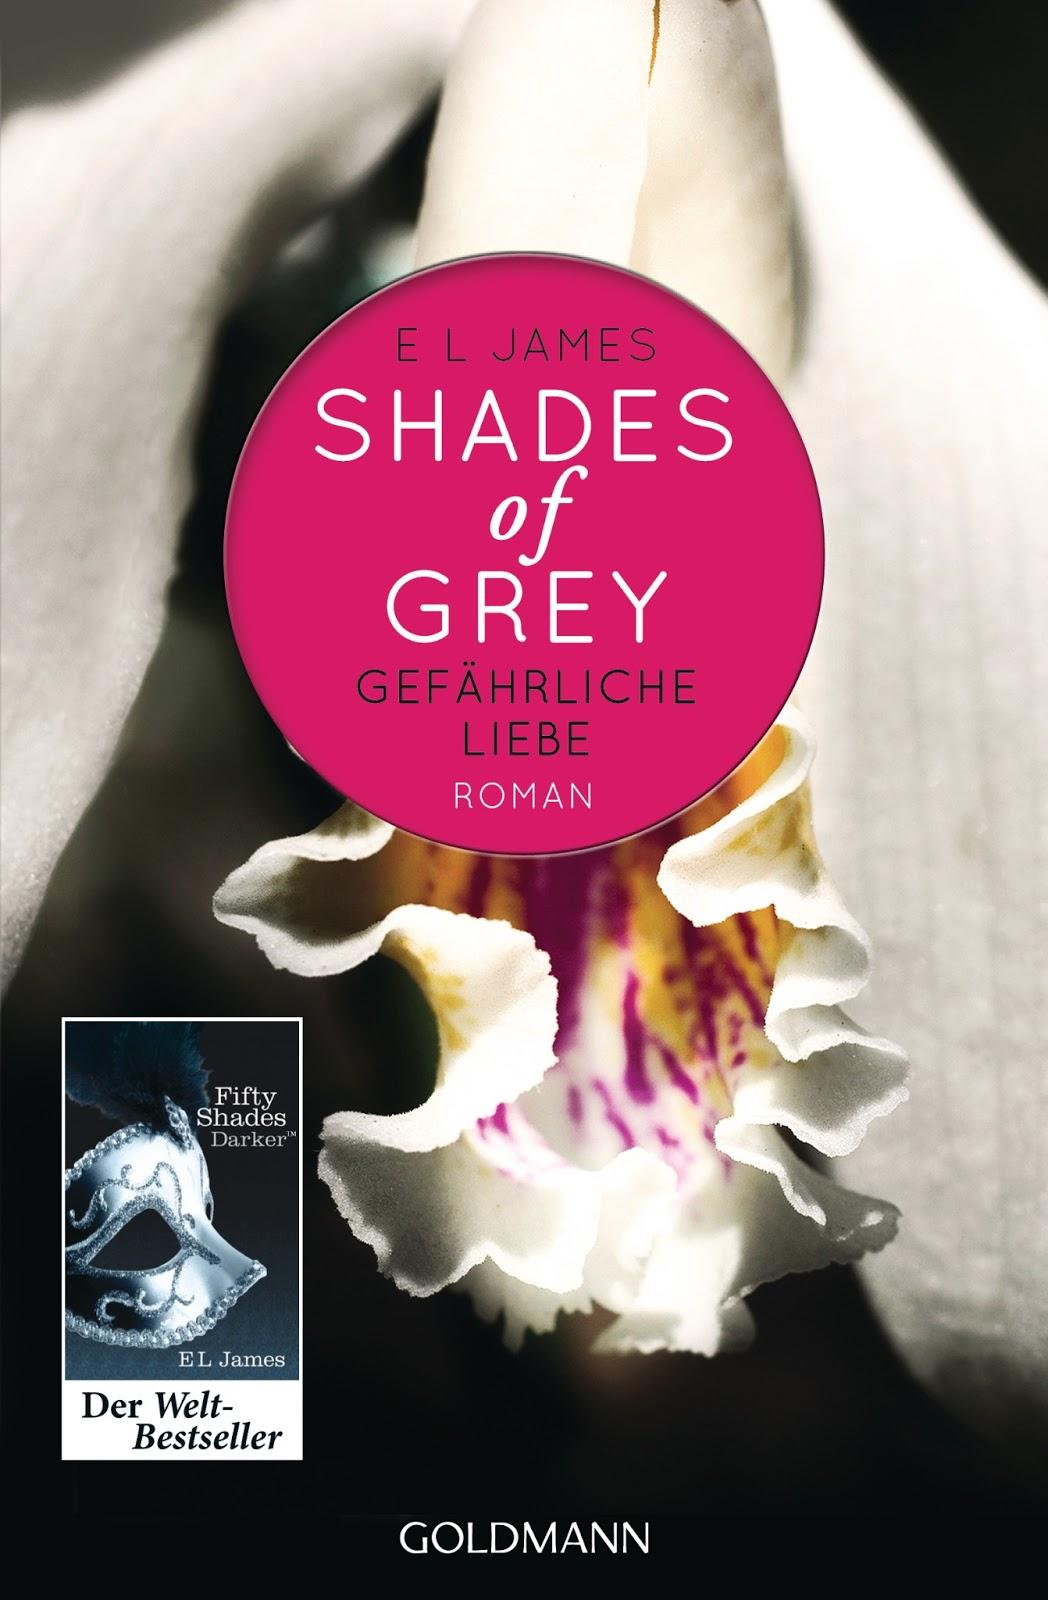 the mystery of books rezension zu shades of grey gef hrliche liebe von e l james. Black Bedroom Furniture Sets. Home Design Ideas